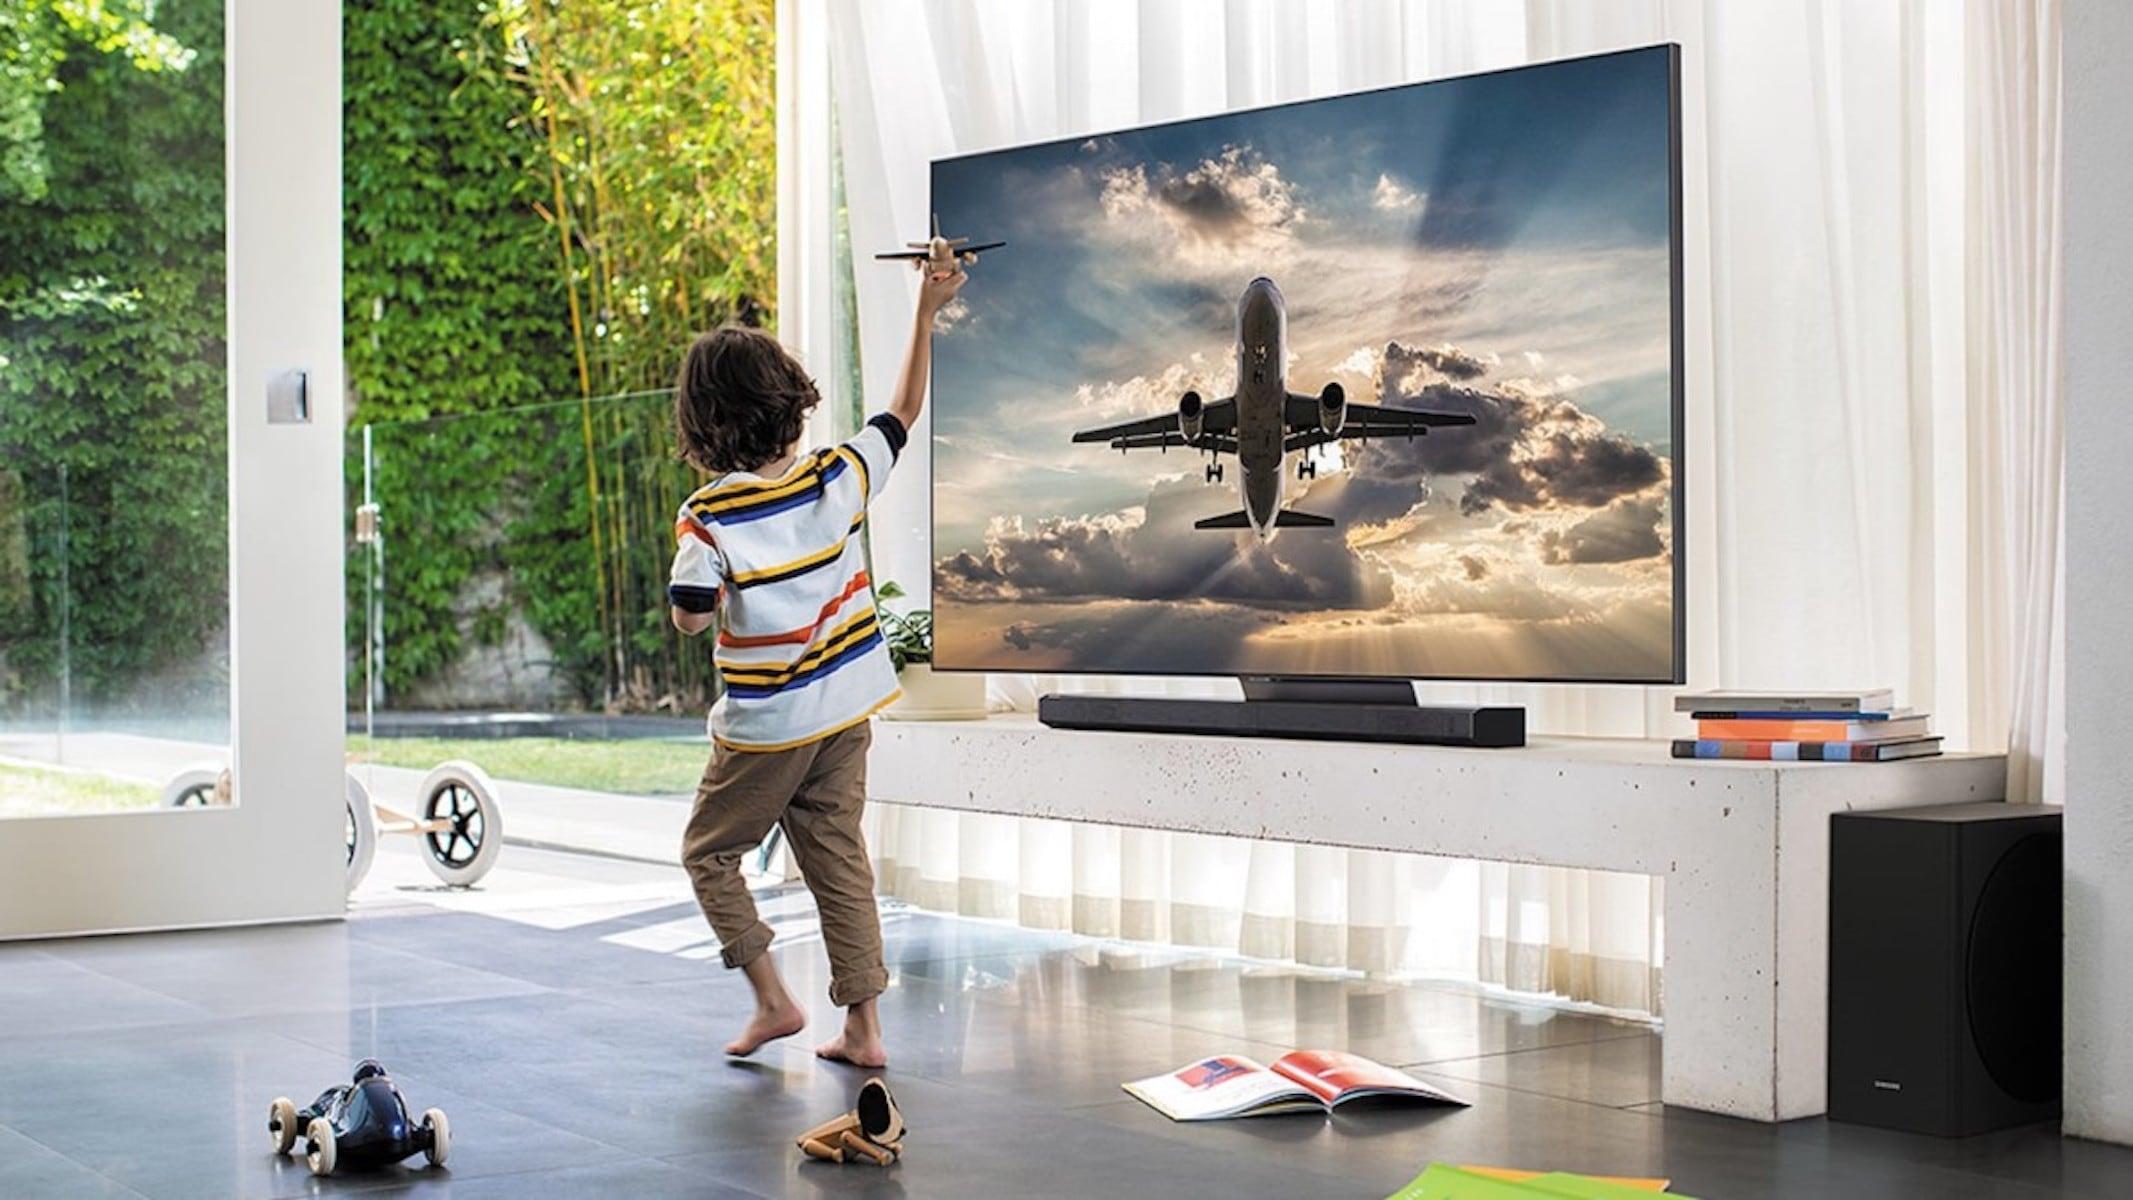 Lg Vs Samsung Tv 2021 Who S Winning The Smart Tv War Gadget Flow